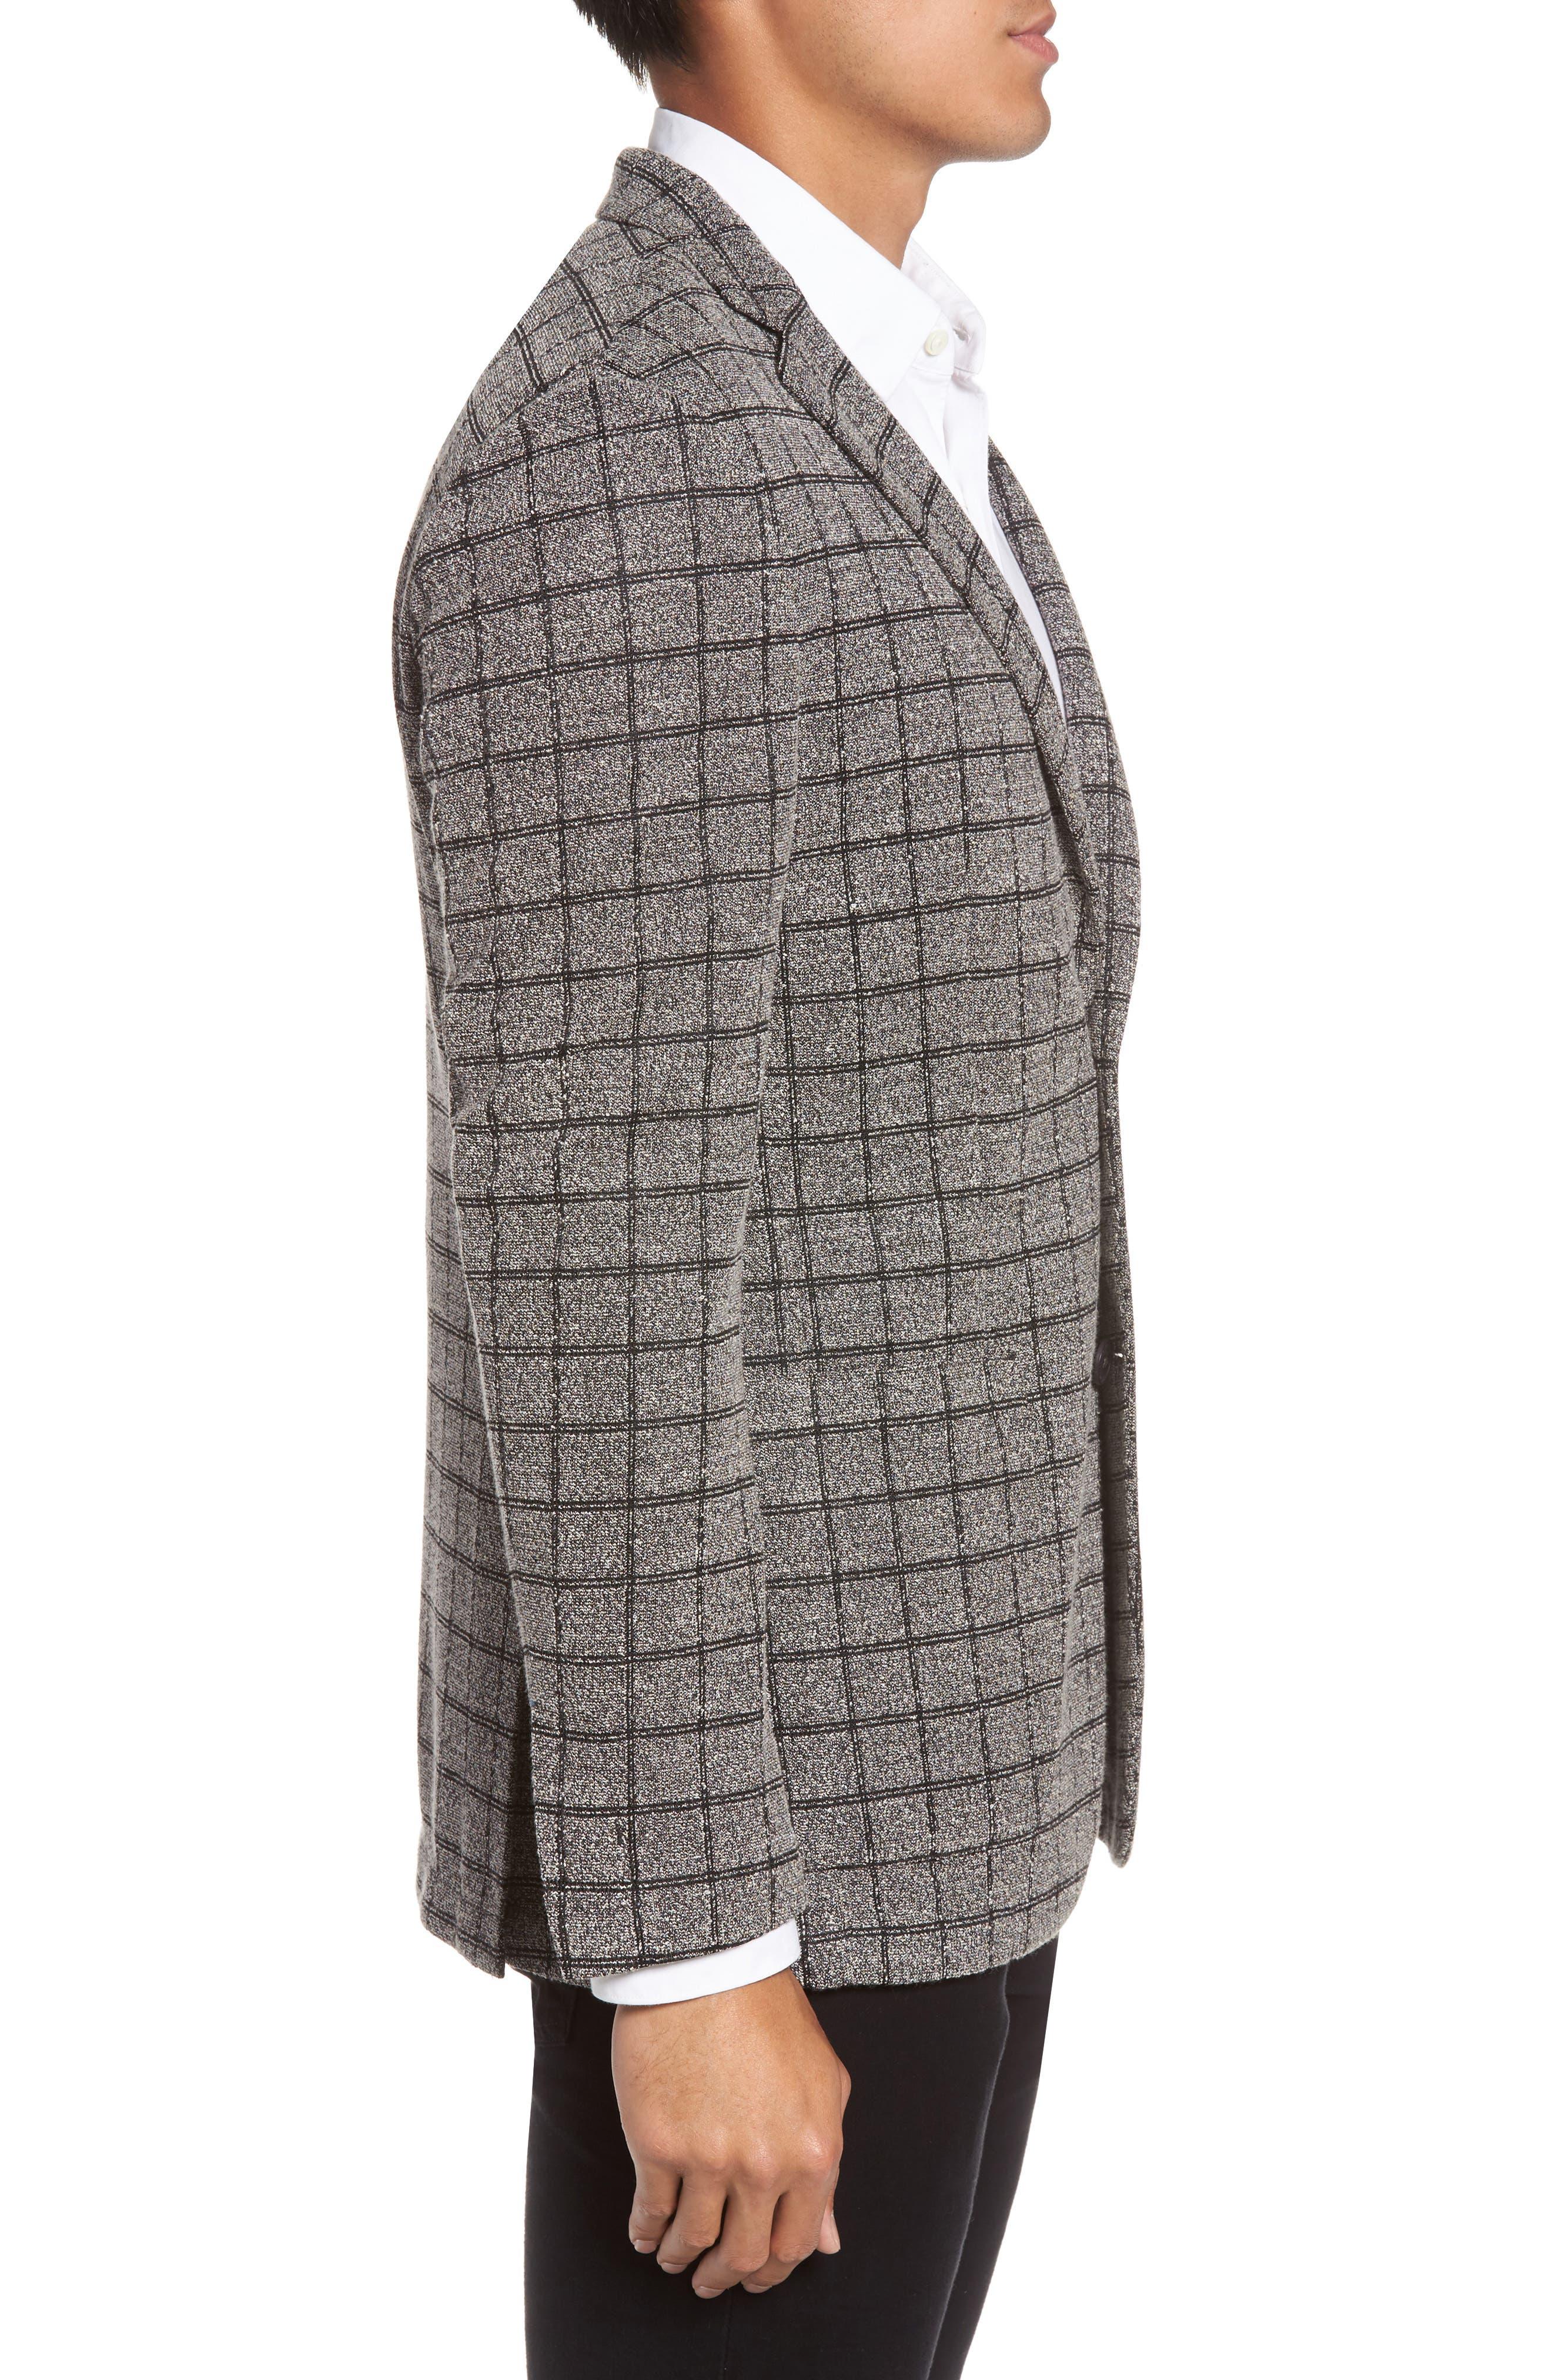 Del Aria Slim Fit Check Knit Jacket,                             Alternate thumbnail 3, color,                             020